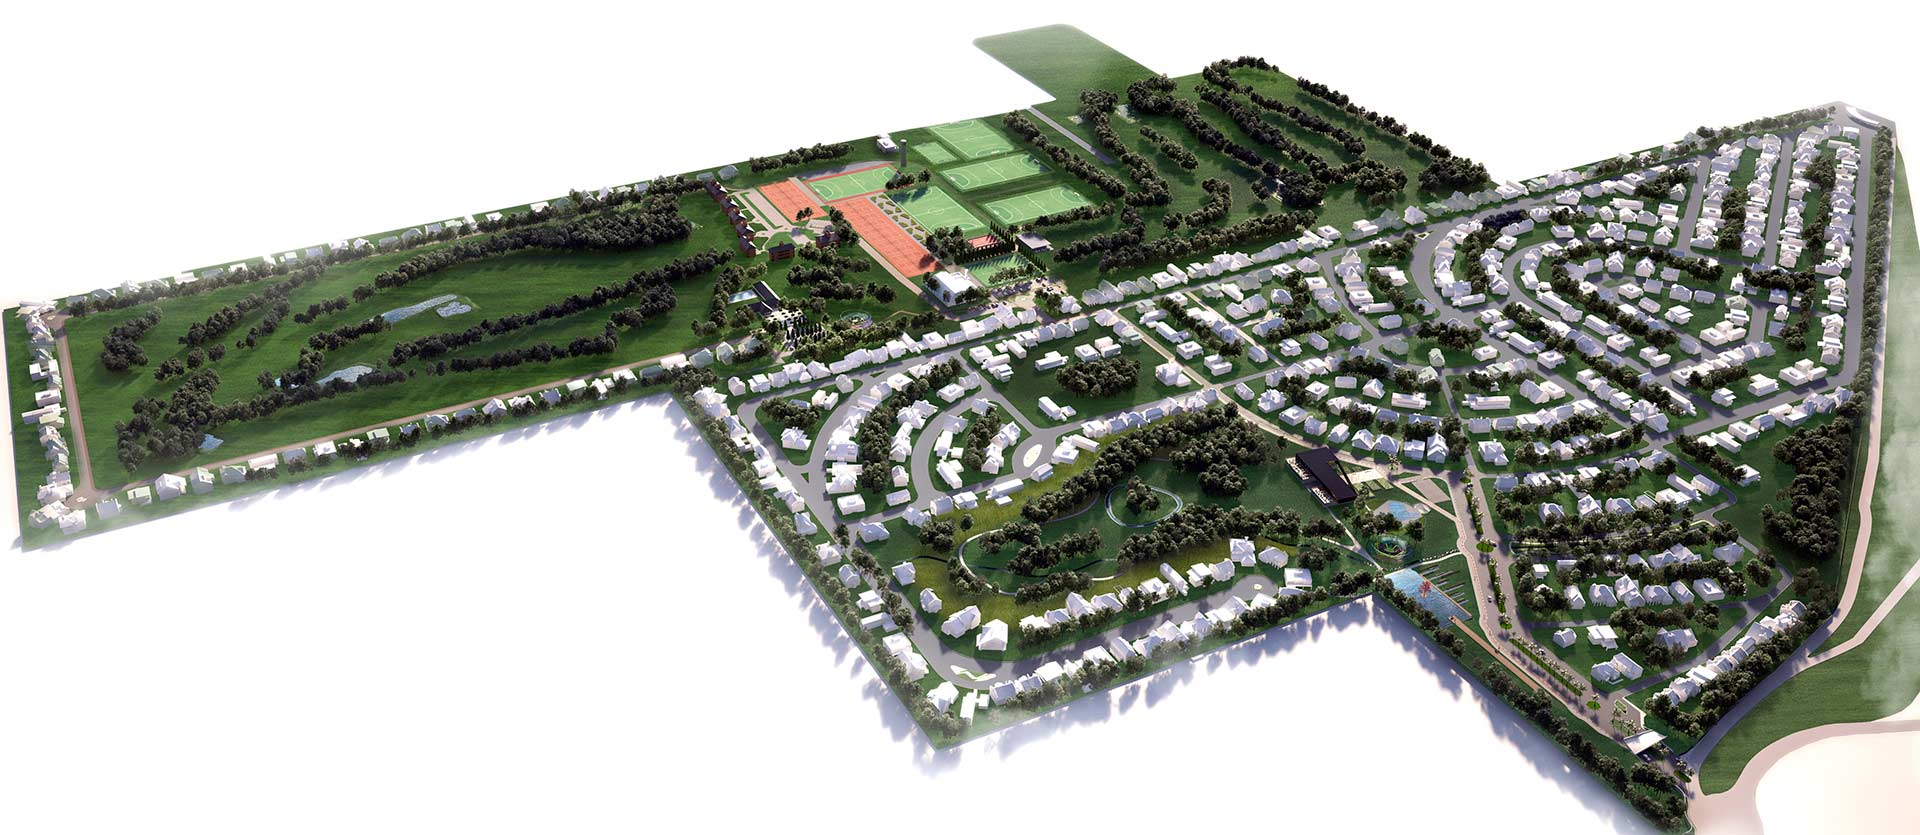 Arquitectura y Paisajismo Perspectiva Aerea General Masterplan Miraflores Country Club